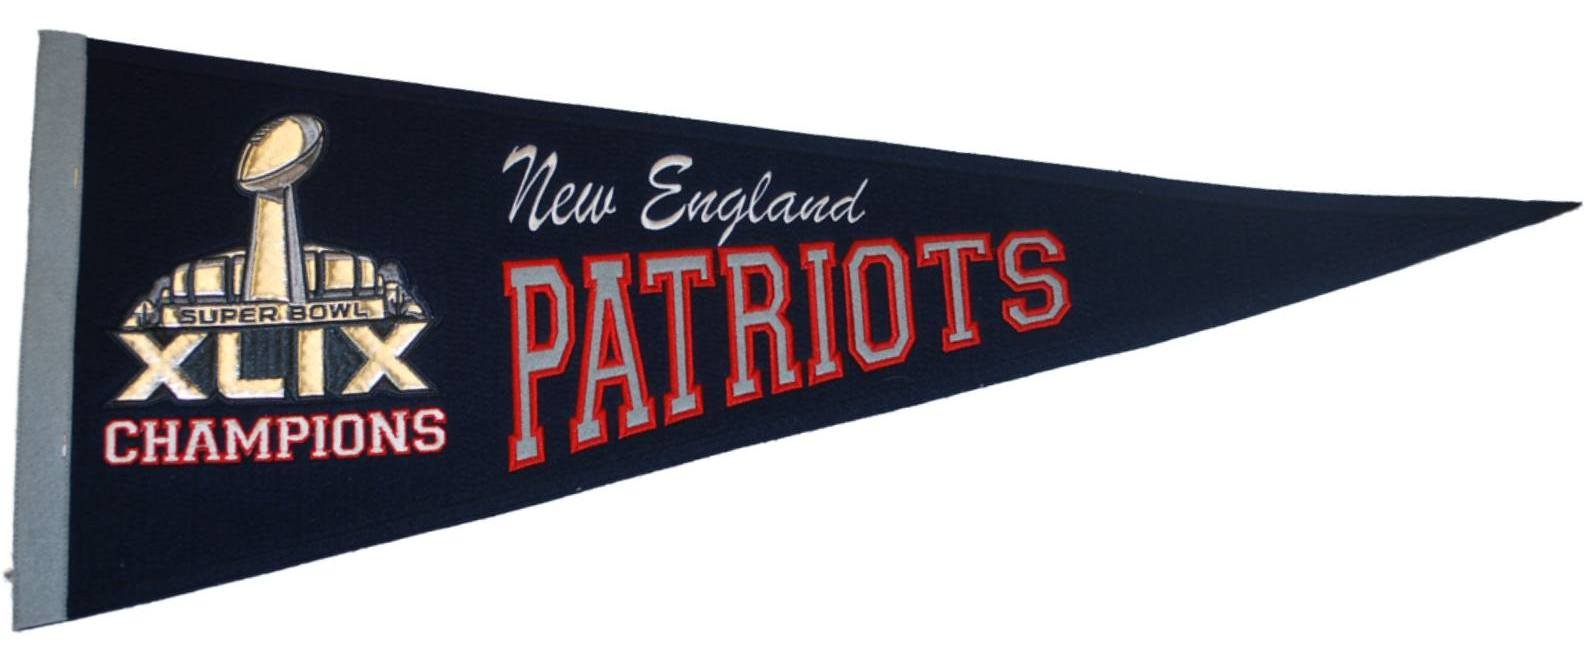 New England Patriots 2015 Super Bowl XLIX Champions Wool Navy Classic Pennant